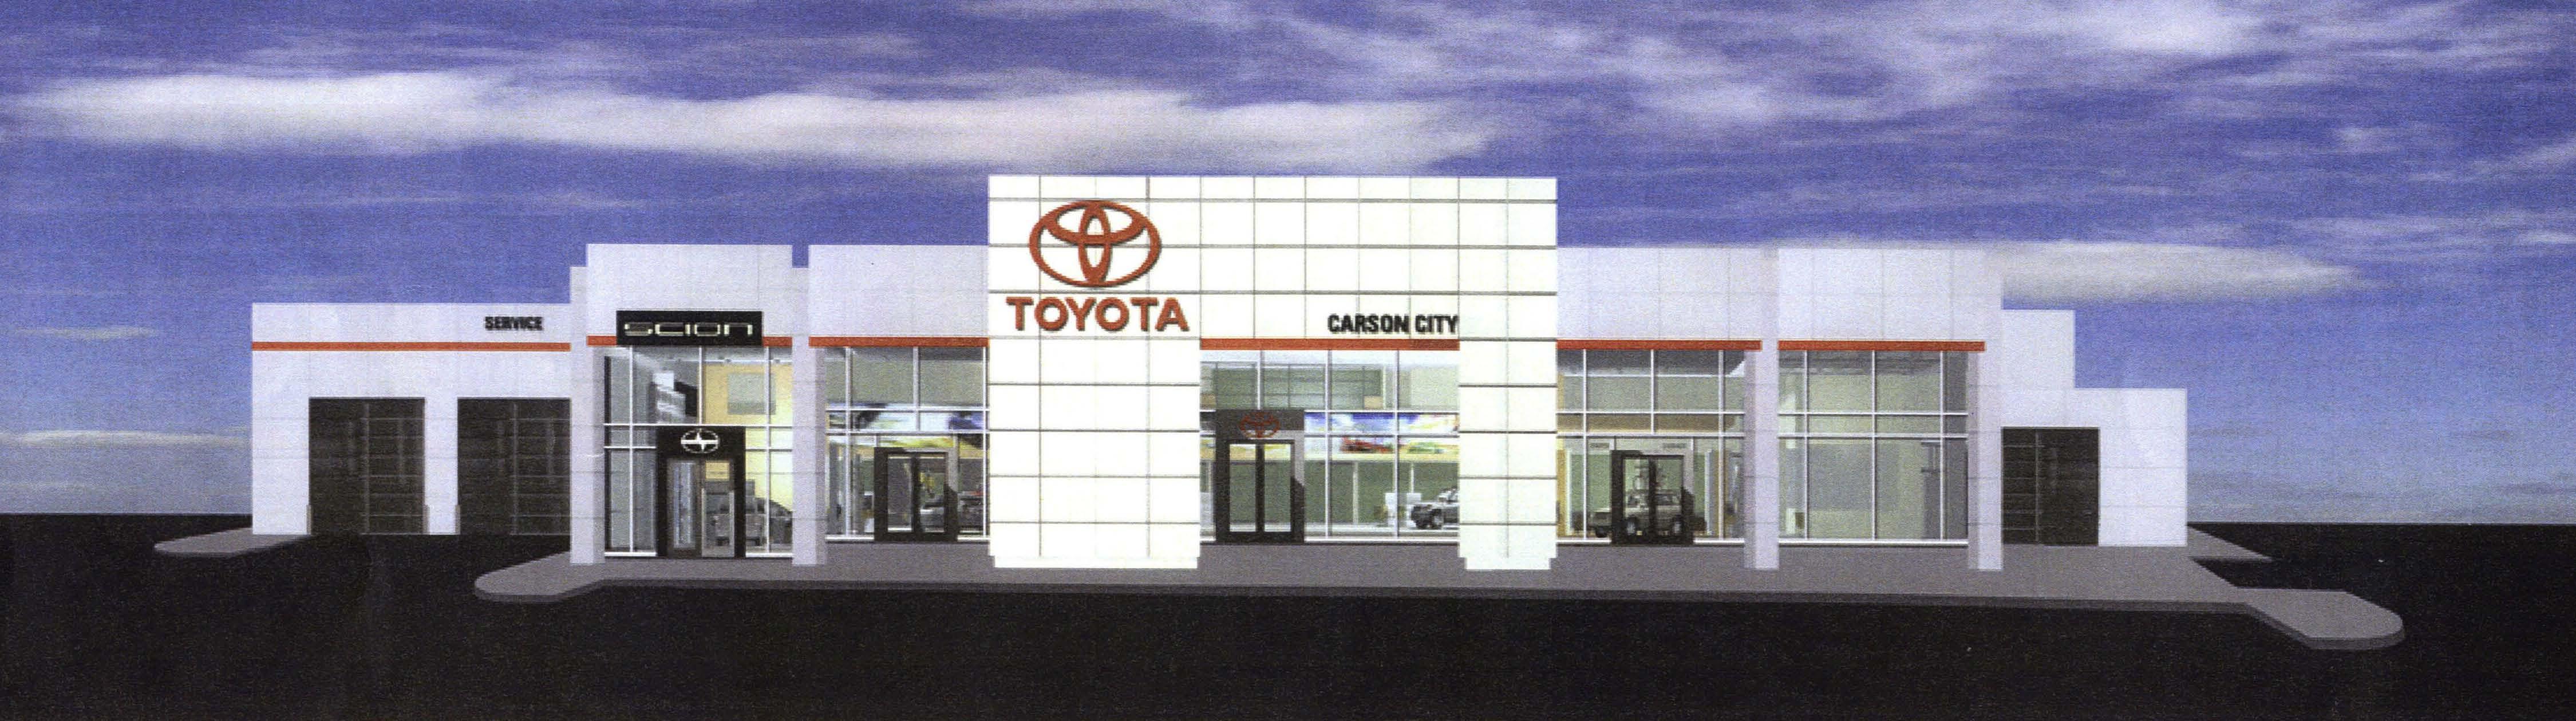 R L Davidson Architects Carson City Toyota